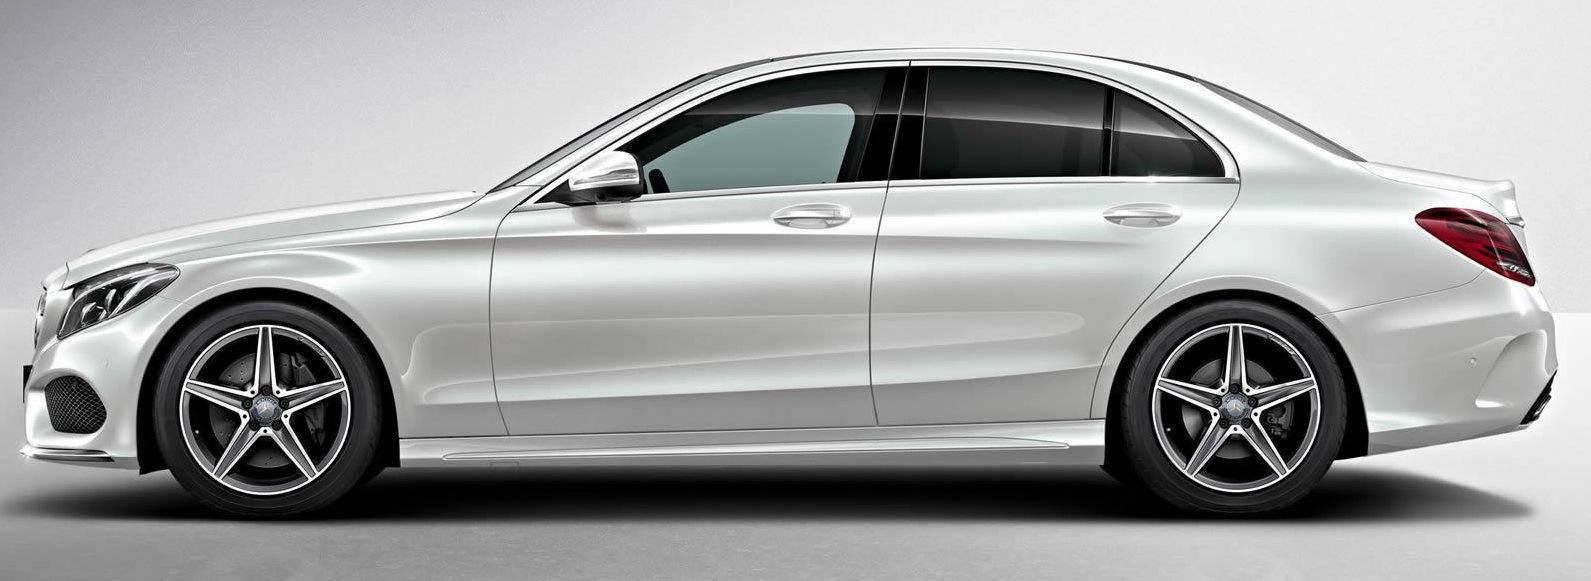 Mercedes C-Class W205 — Apple TV Box + Smarphone Mirrorlink